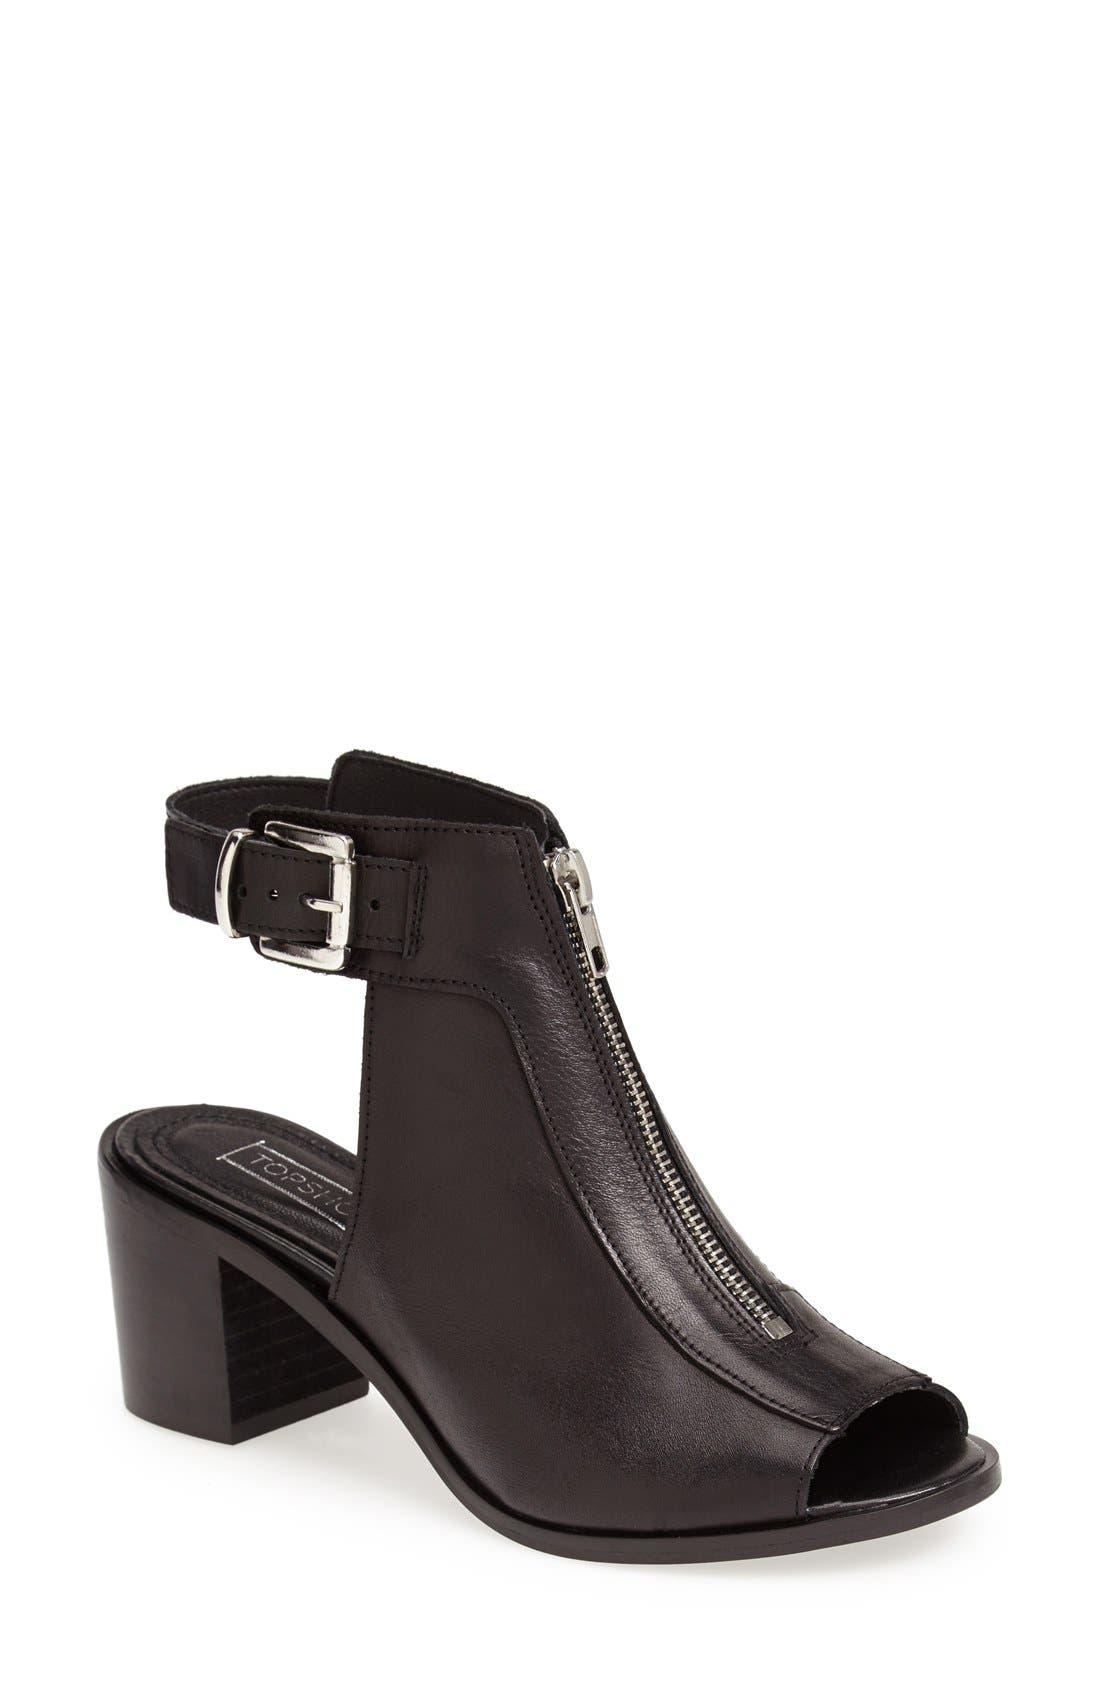 Main Image - Topshop 'Jada' Zip Front Sandal (Women)